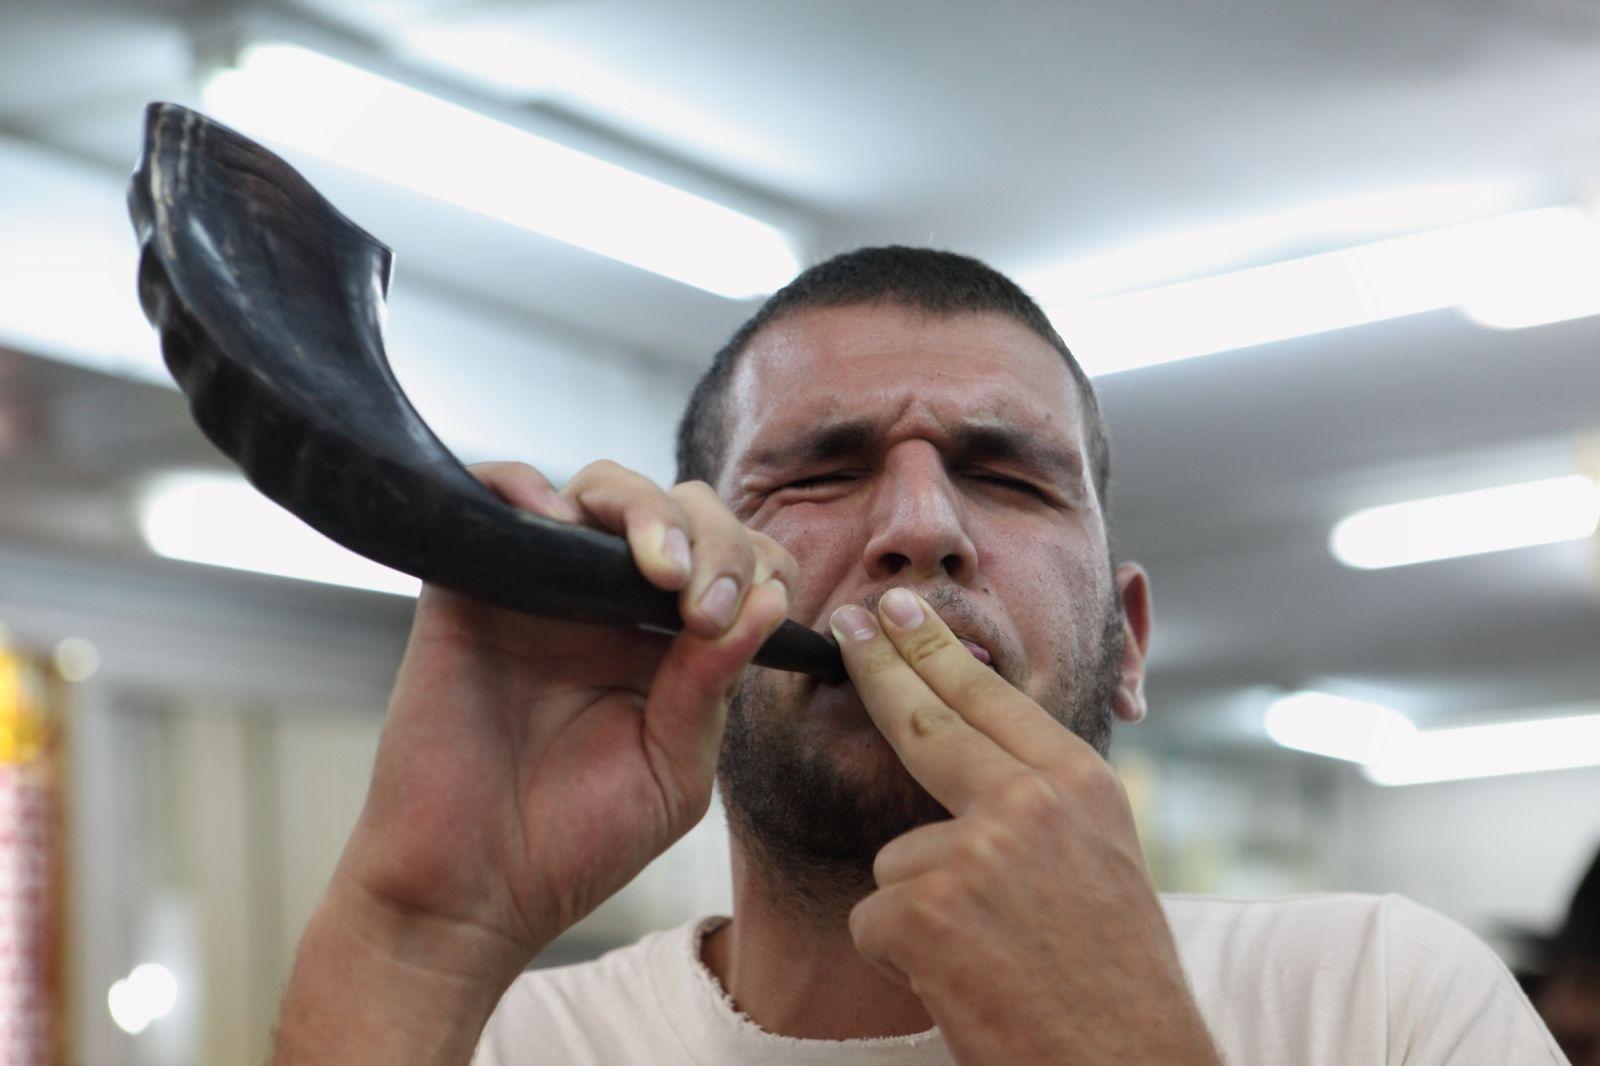 Blowing a shofar at the Rabbi Basri Yeshiva in Beersheva. Photo by Yaakov Naumi/FLASH90